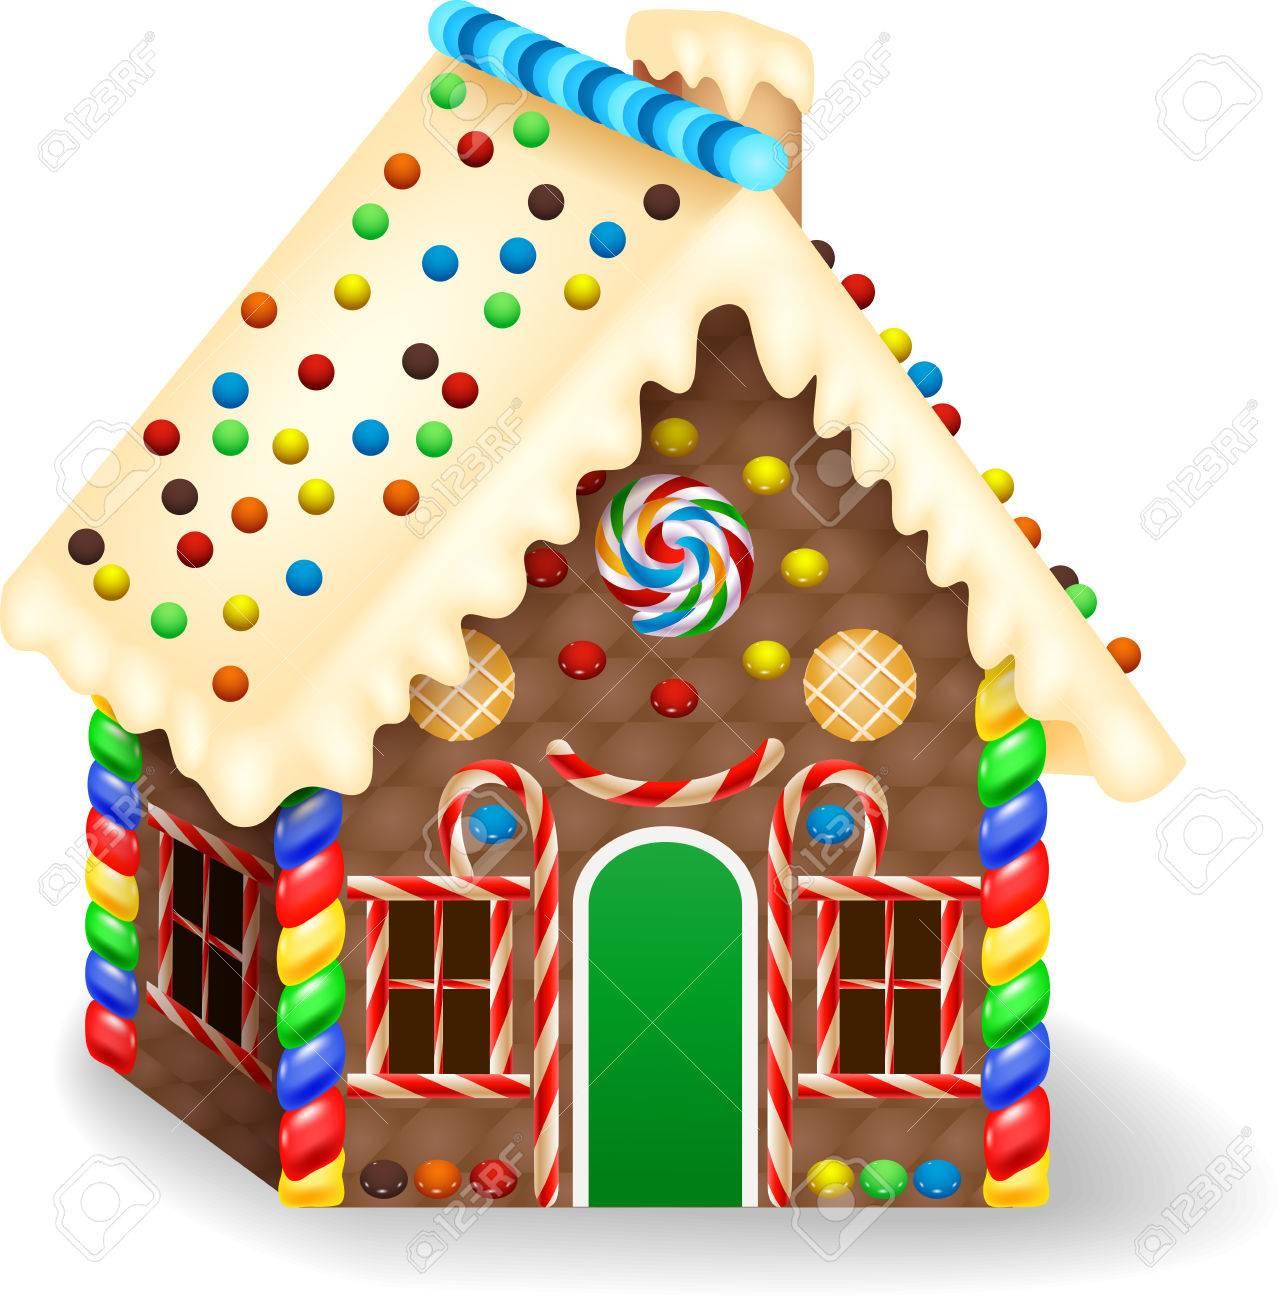 cartoon gingerbread house royalty free cliparts vectors and stock rh 123rf com cartoon gingerbread house pictures Simple Gingerbread House Cartoon